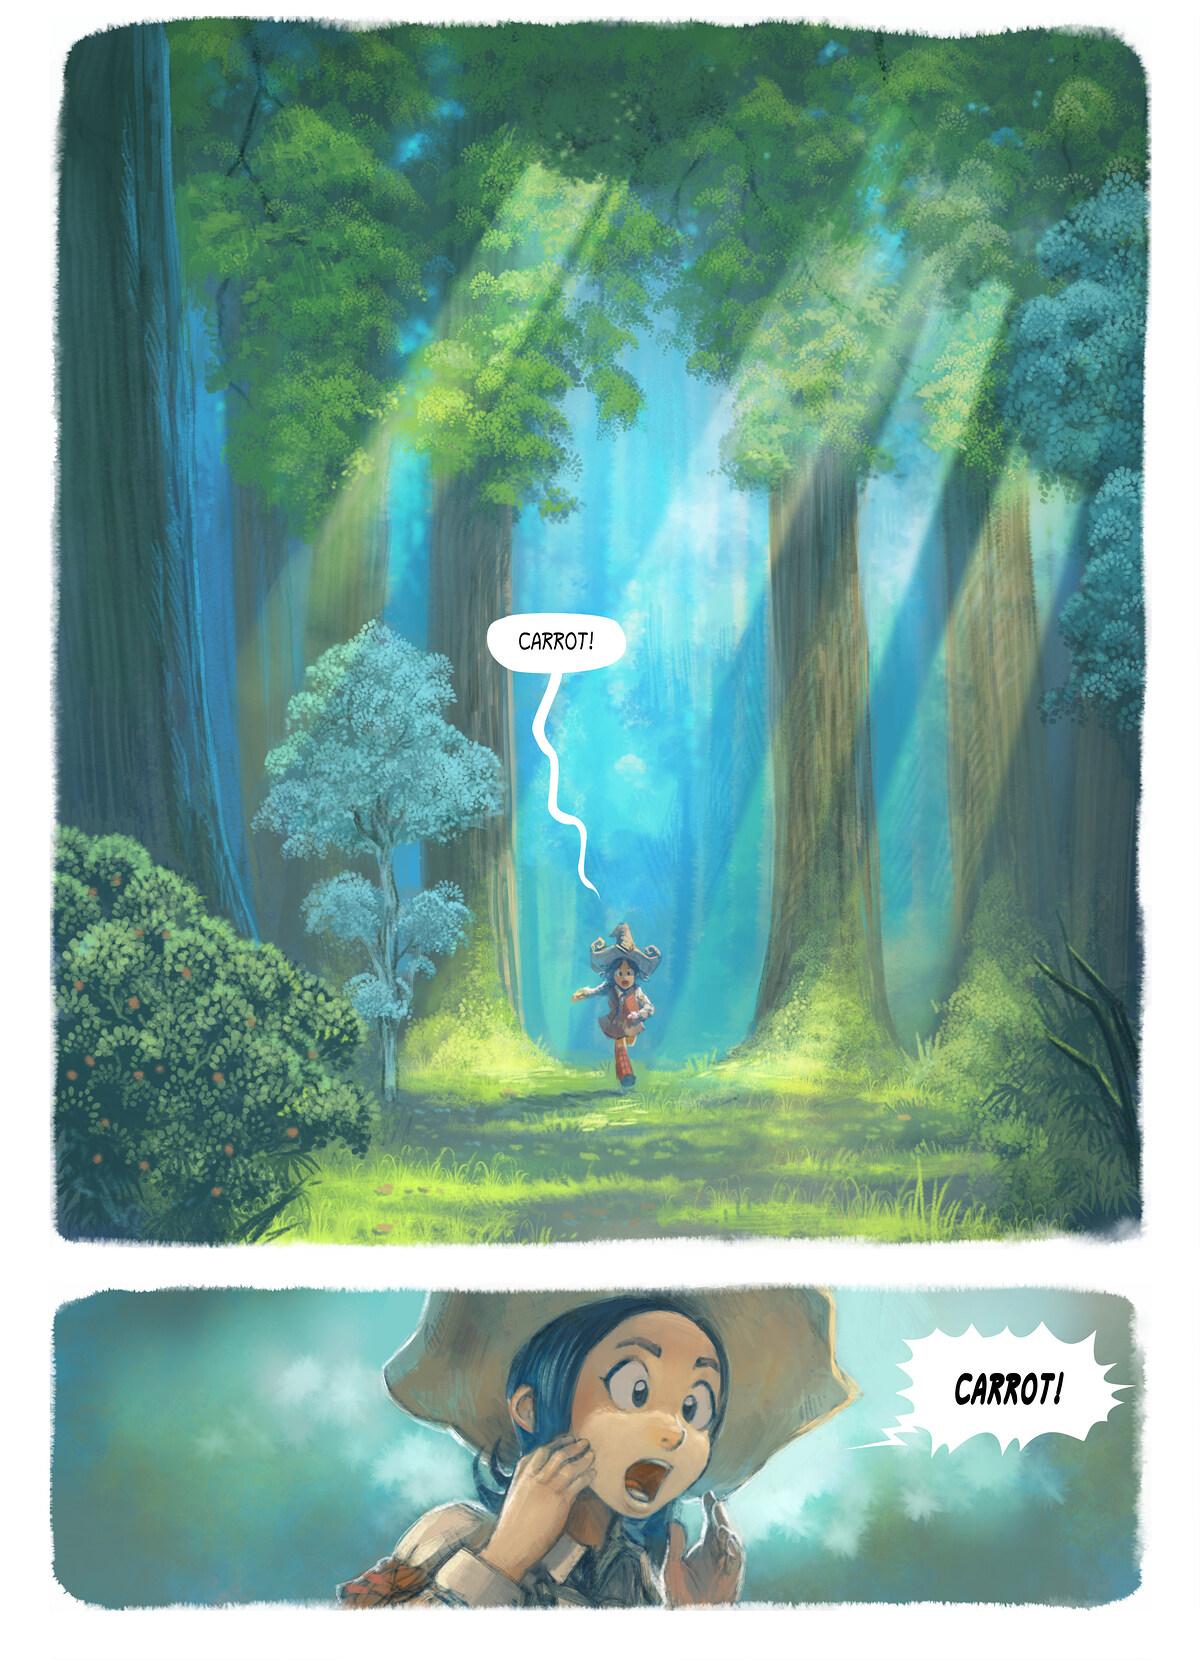 A webcomic page of Pepper&Carrot, Episode 7 [de], Seite 1